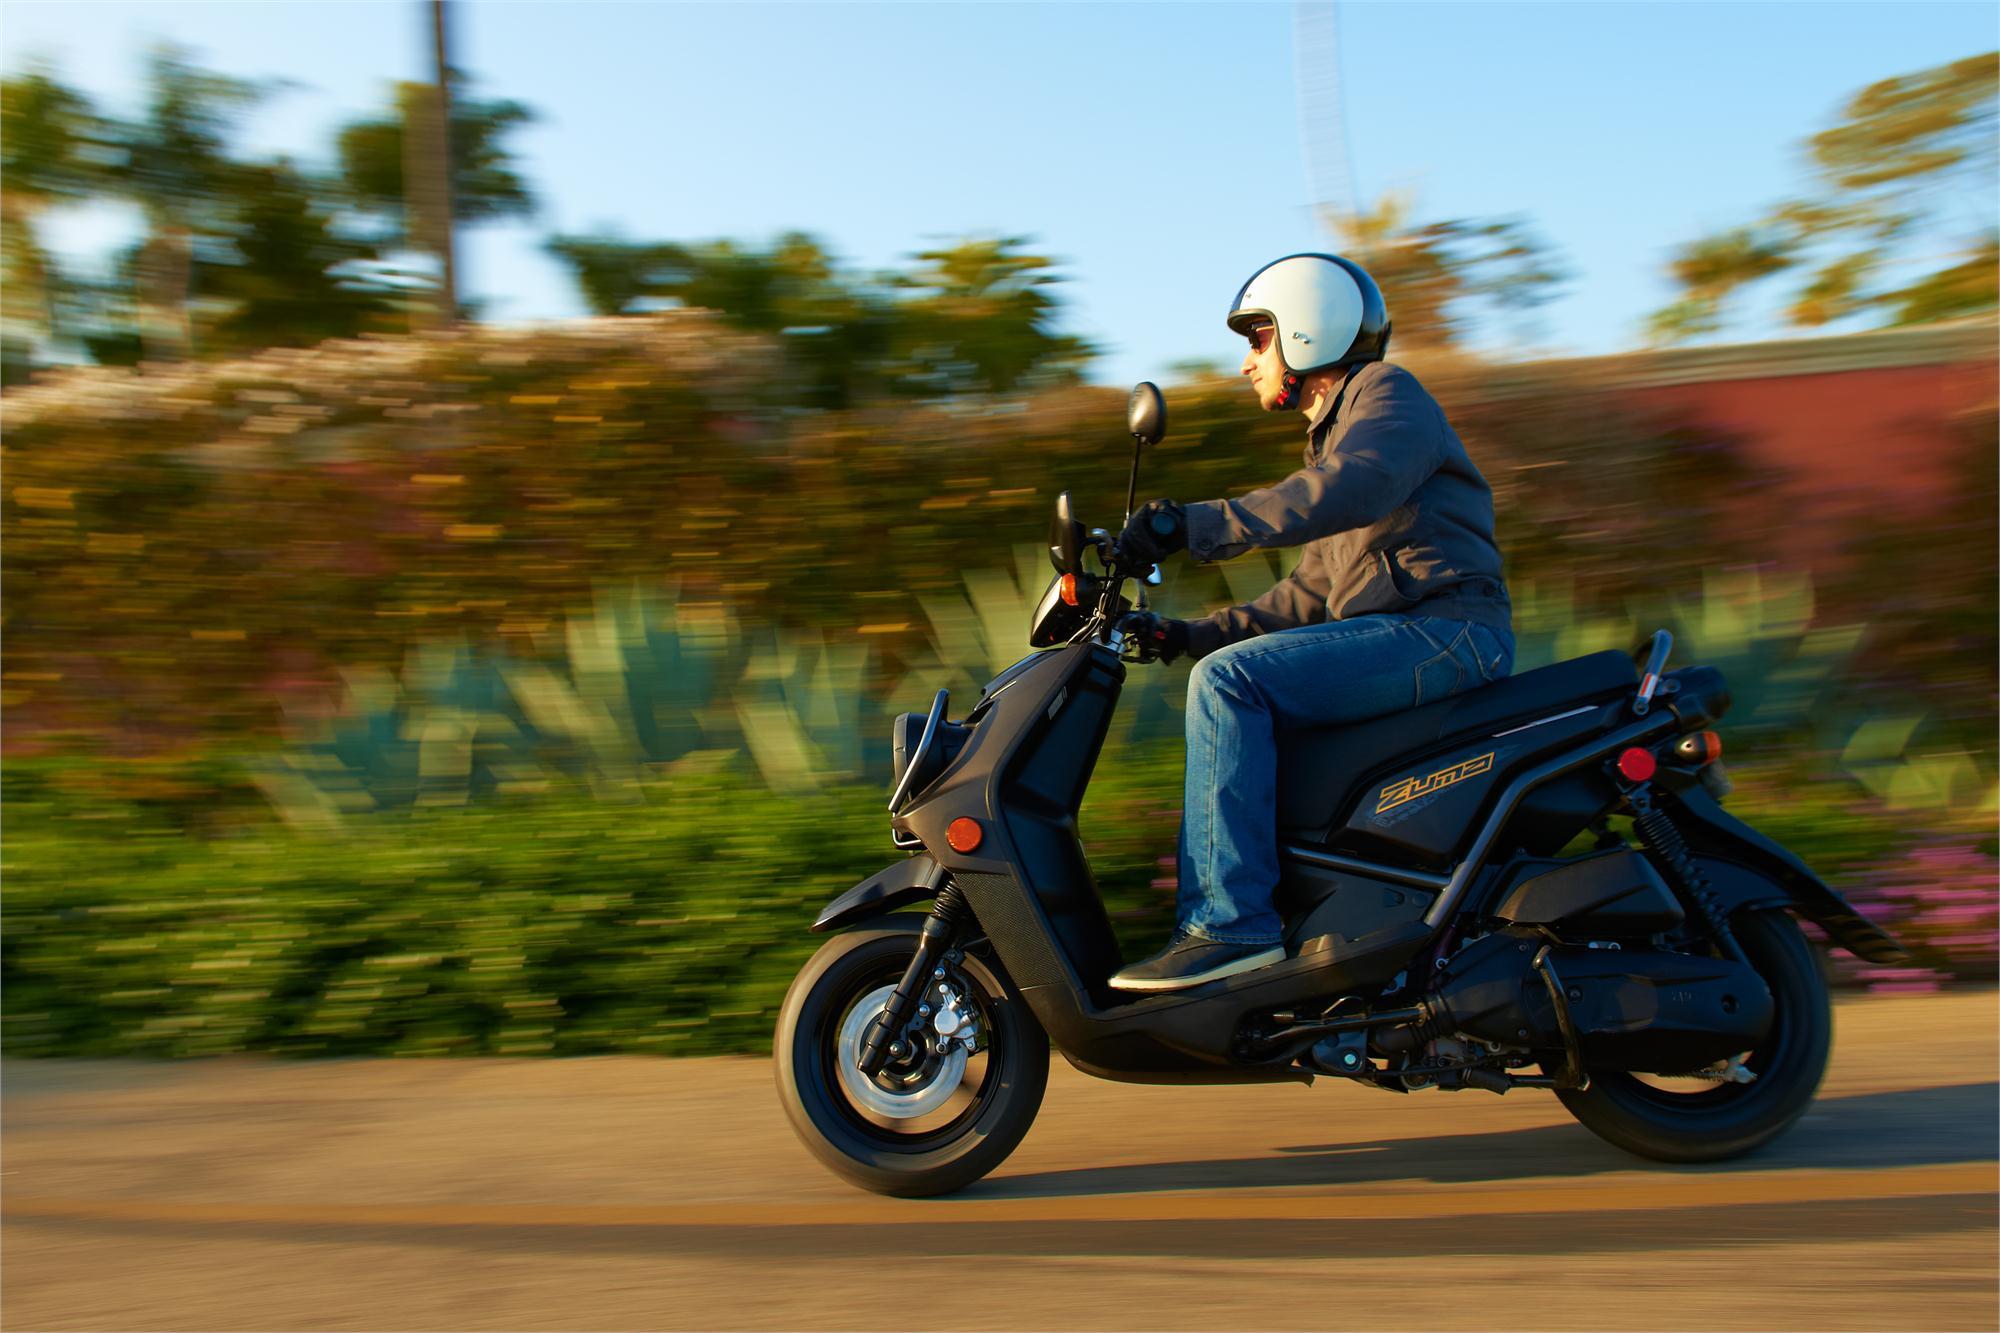 2013 Yamaha Zuma 125 Shows Off-road Brawn - autoevolution